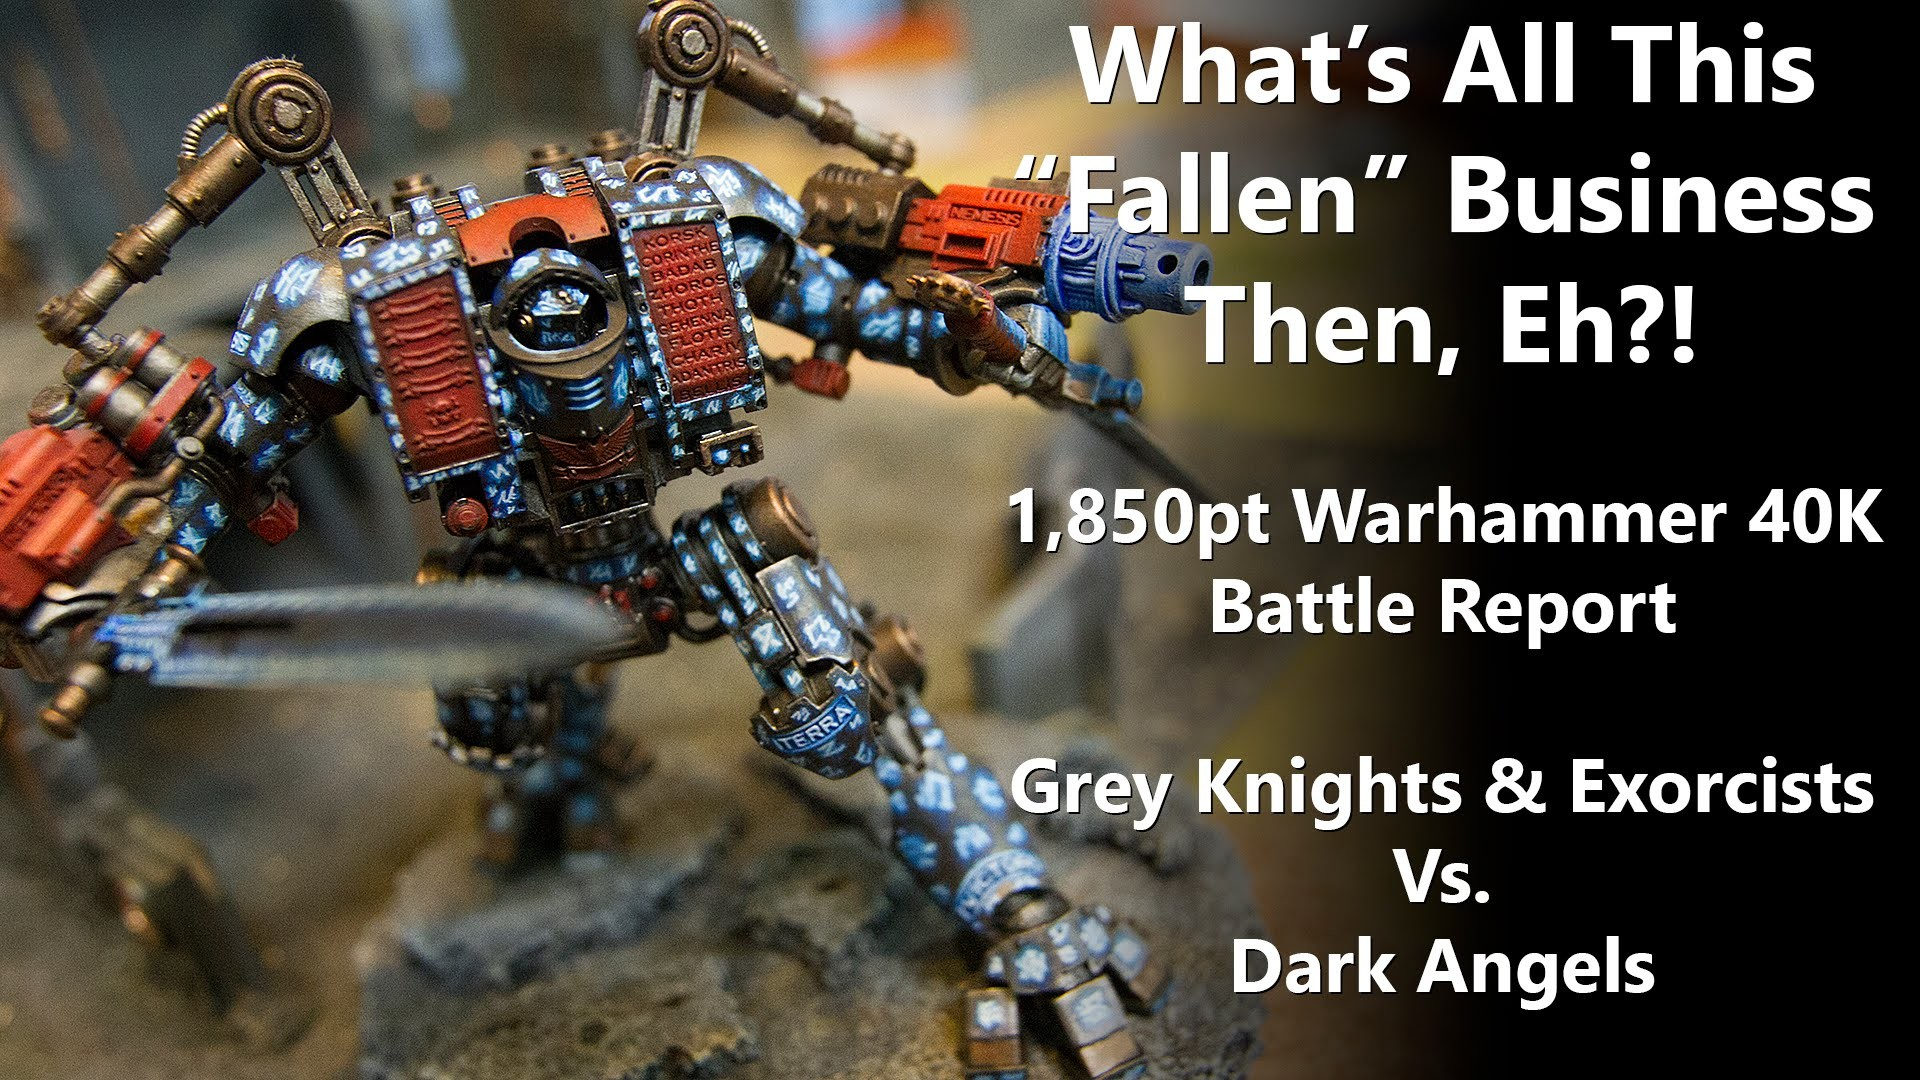 1,850pt Warhammer 40K Battle Report – Grey Knights Vs Dark Angels – YouTube